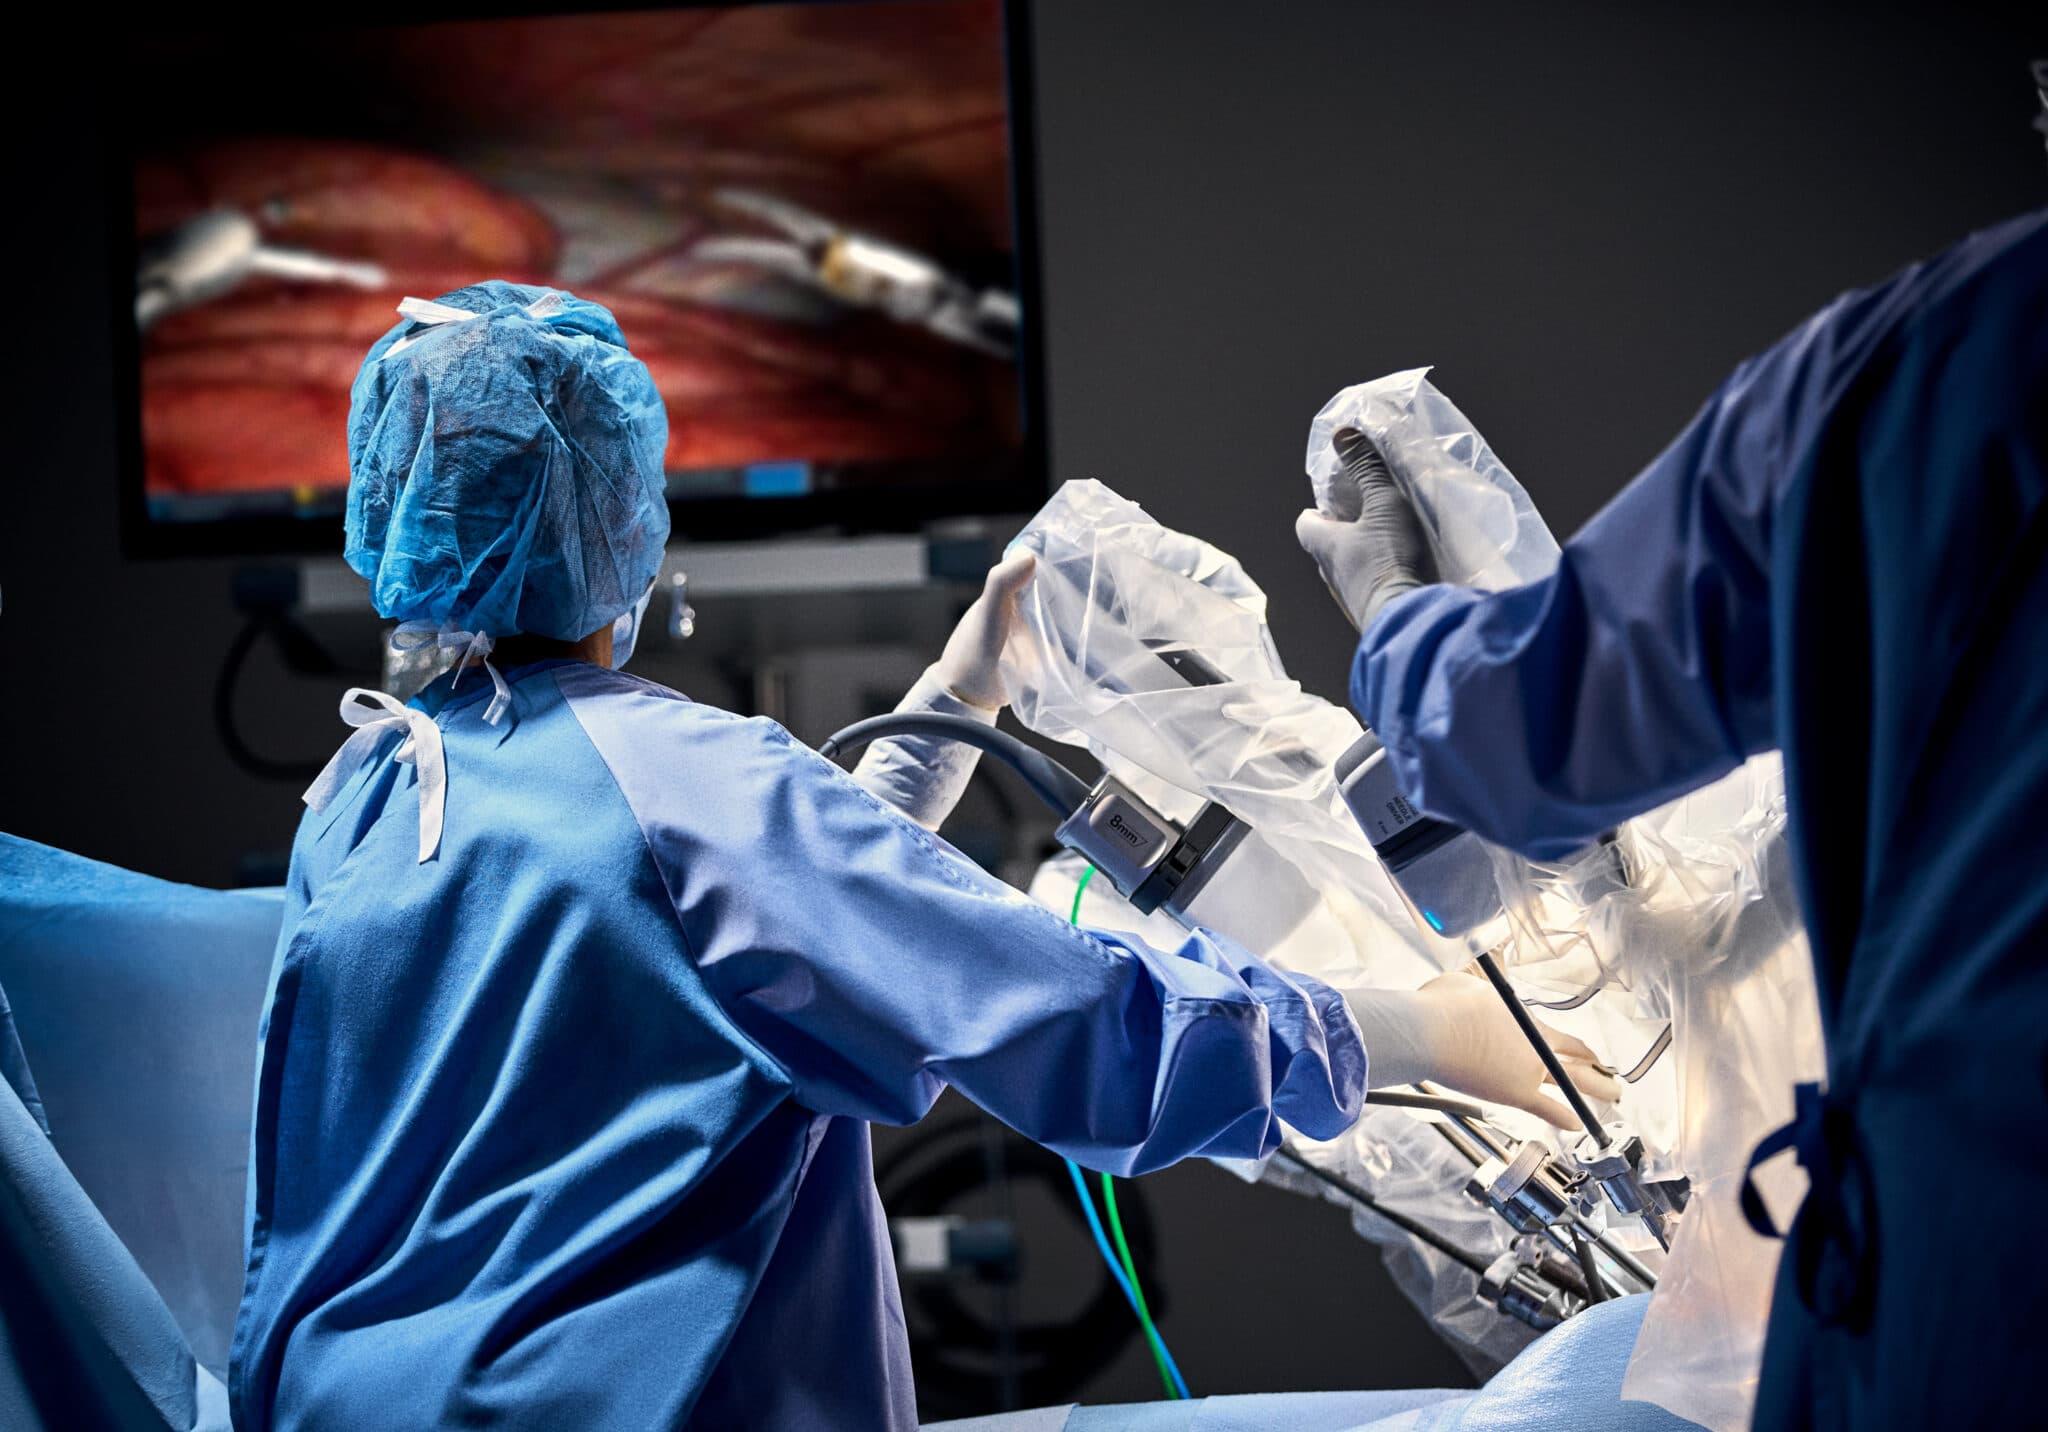 intuitive surgical da vinci